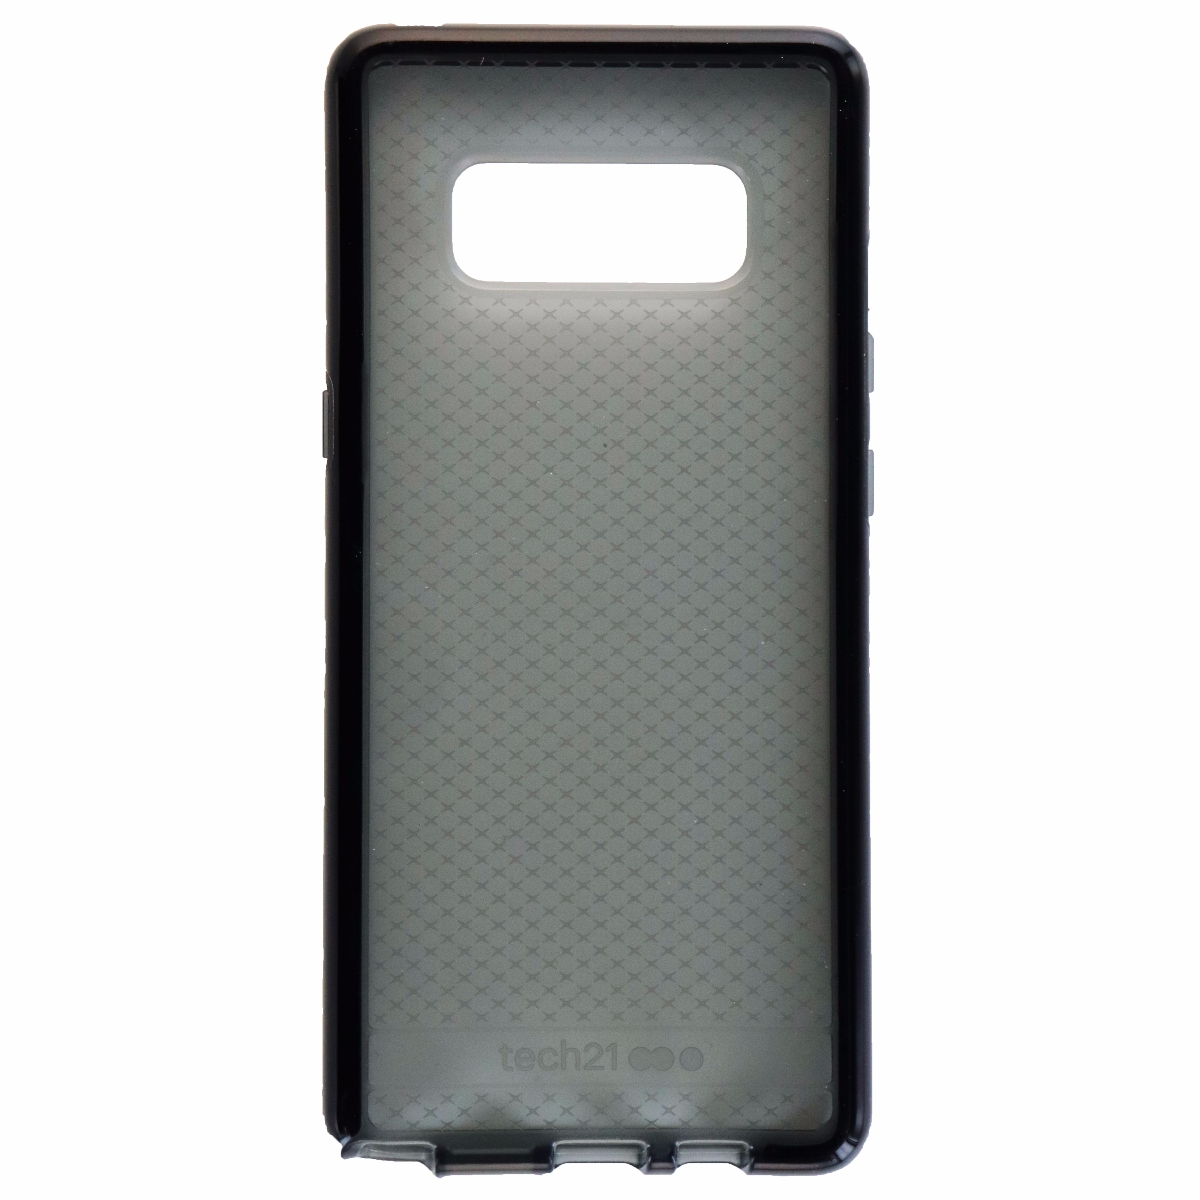 Tech21 Evo Check Series Case Cover for Samsung Galaxy Note 8 - Smokey/Black